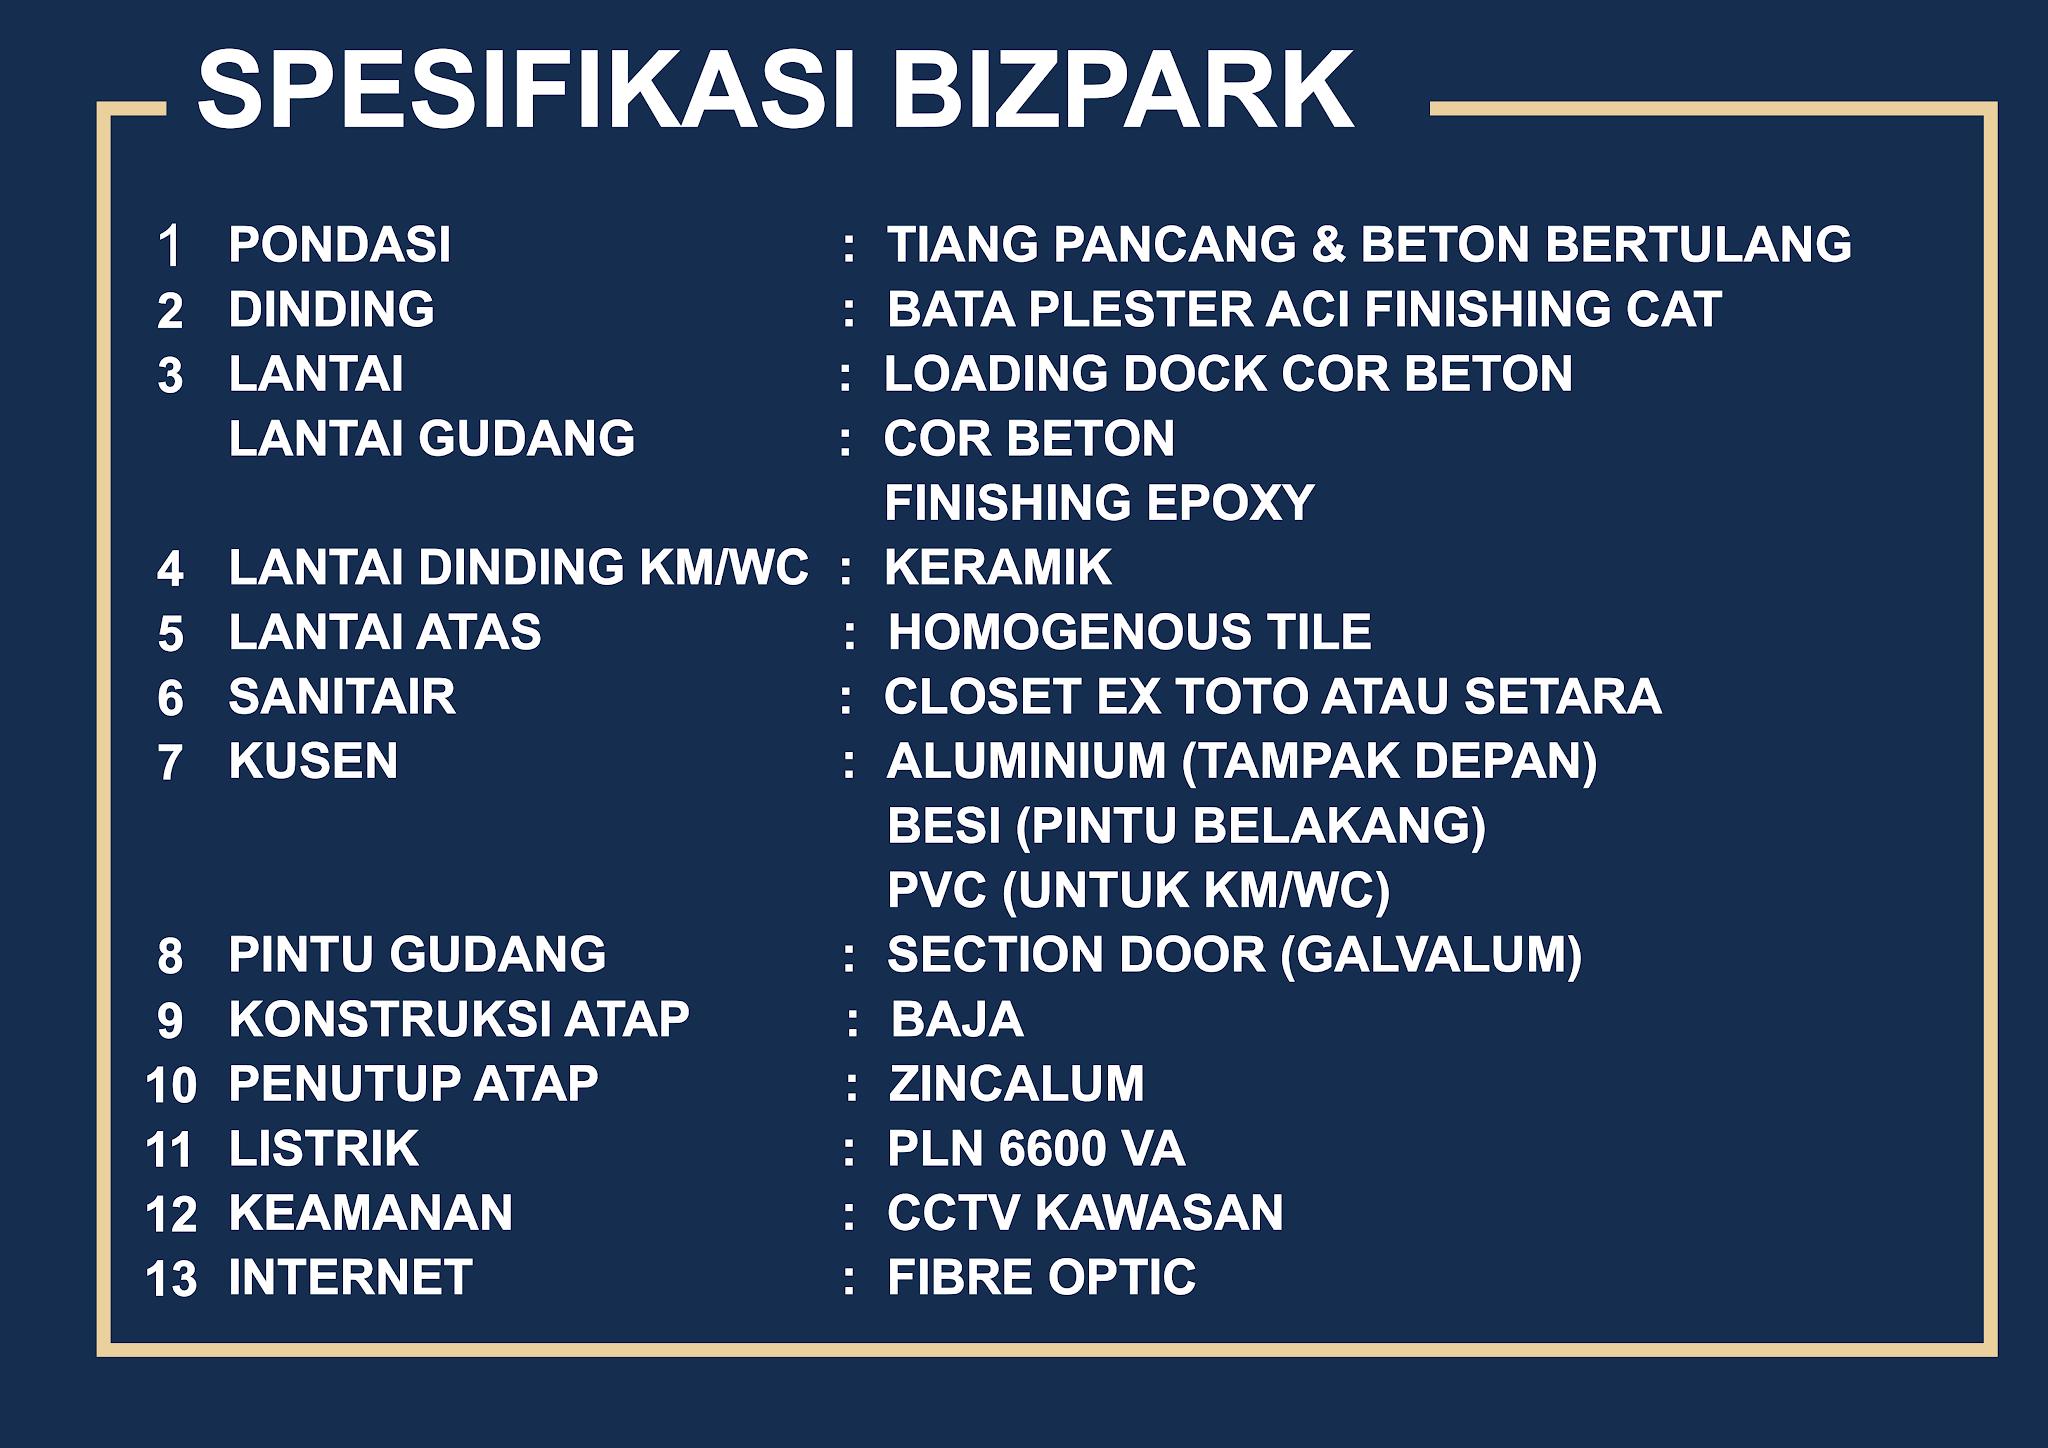 Spesifikasi Bangunan Gudang Bizpark PIK2